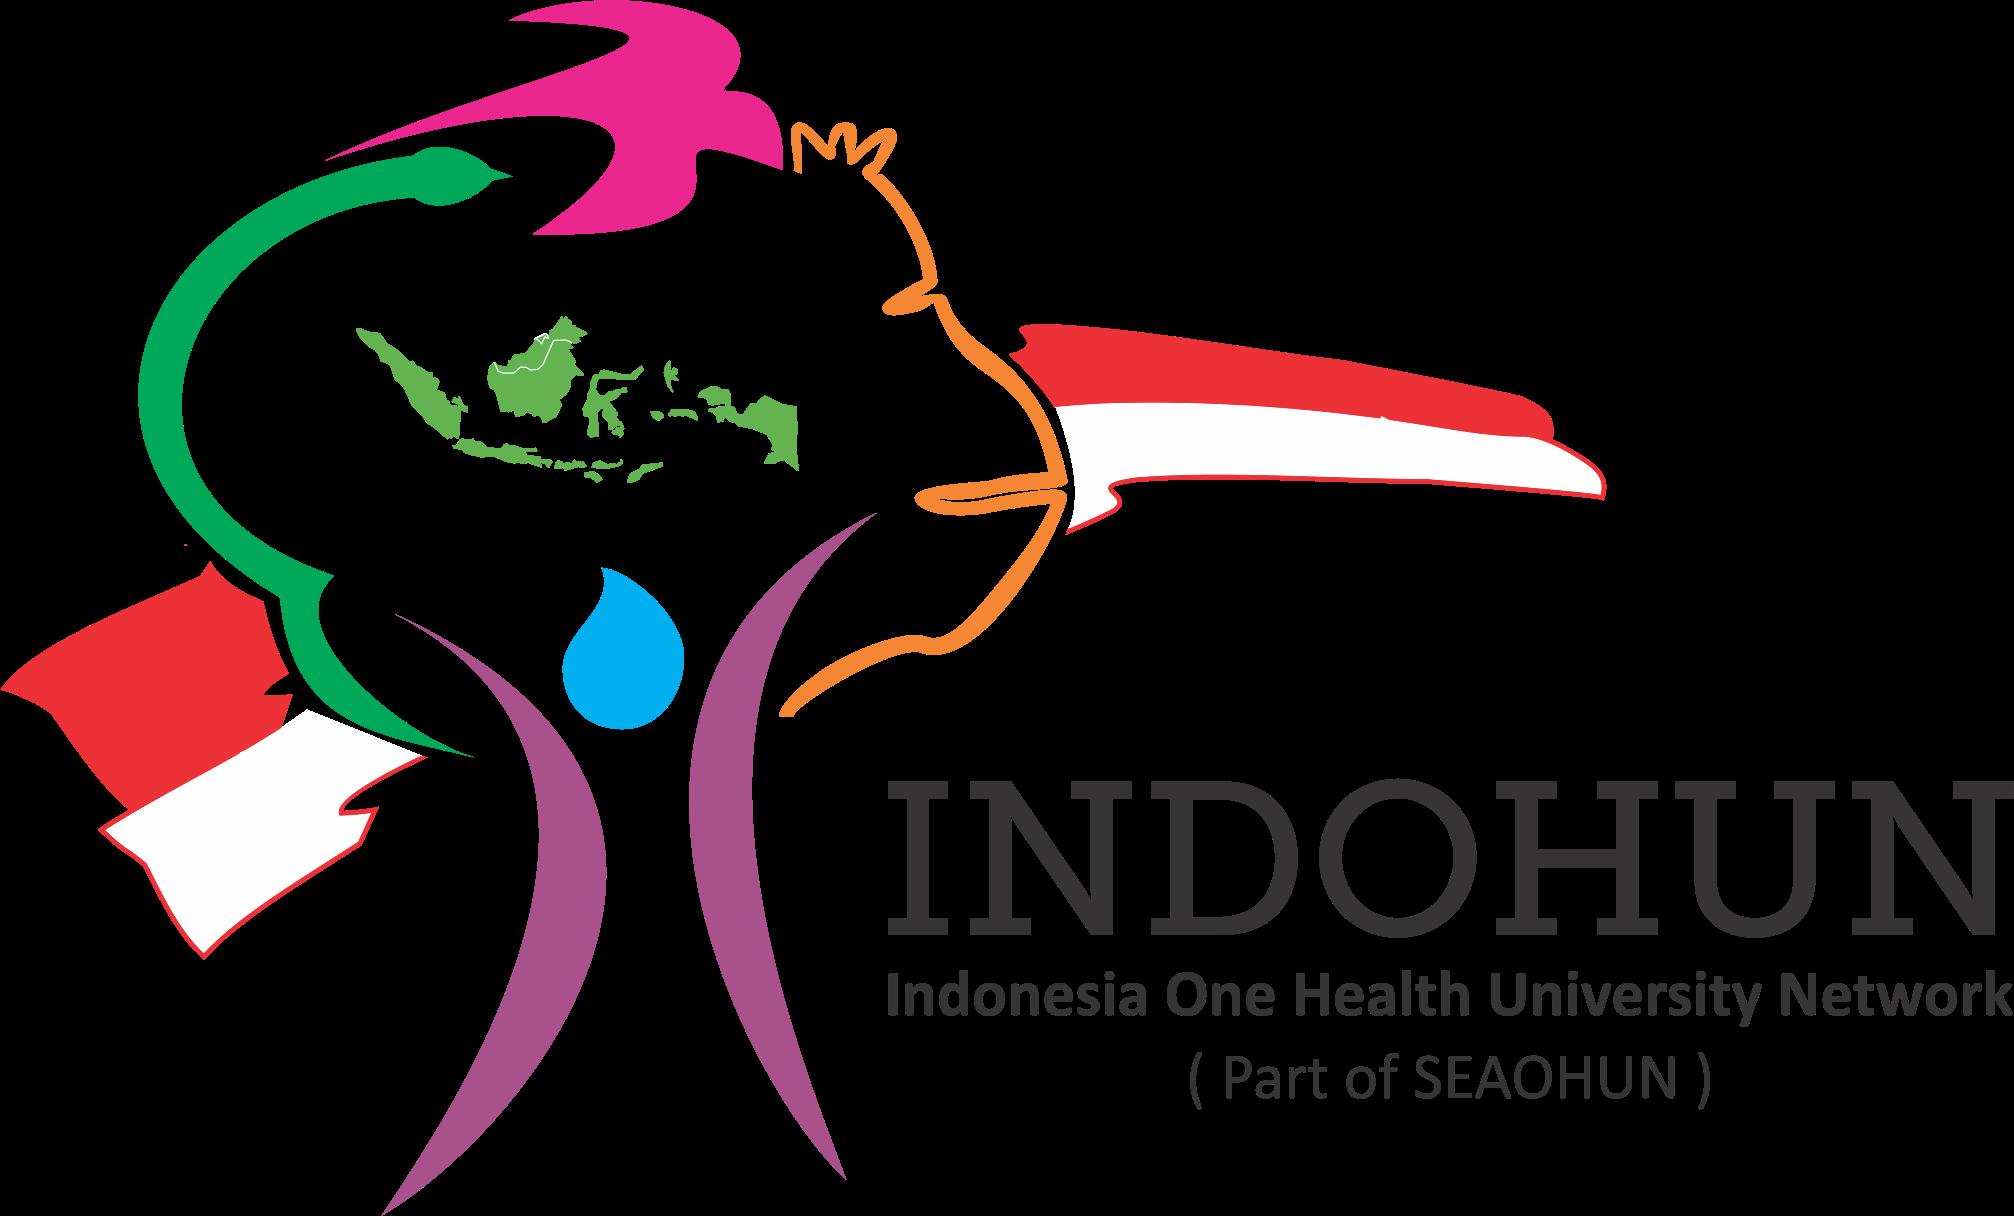 Indonesia One Health University Network Job Vacancy: Laboratory